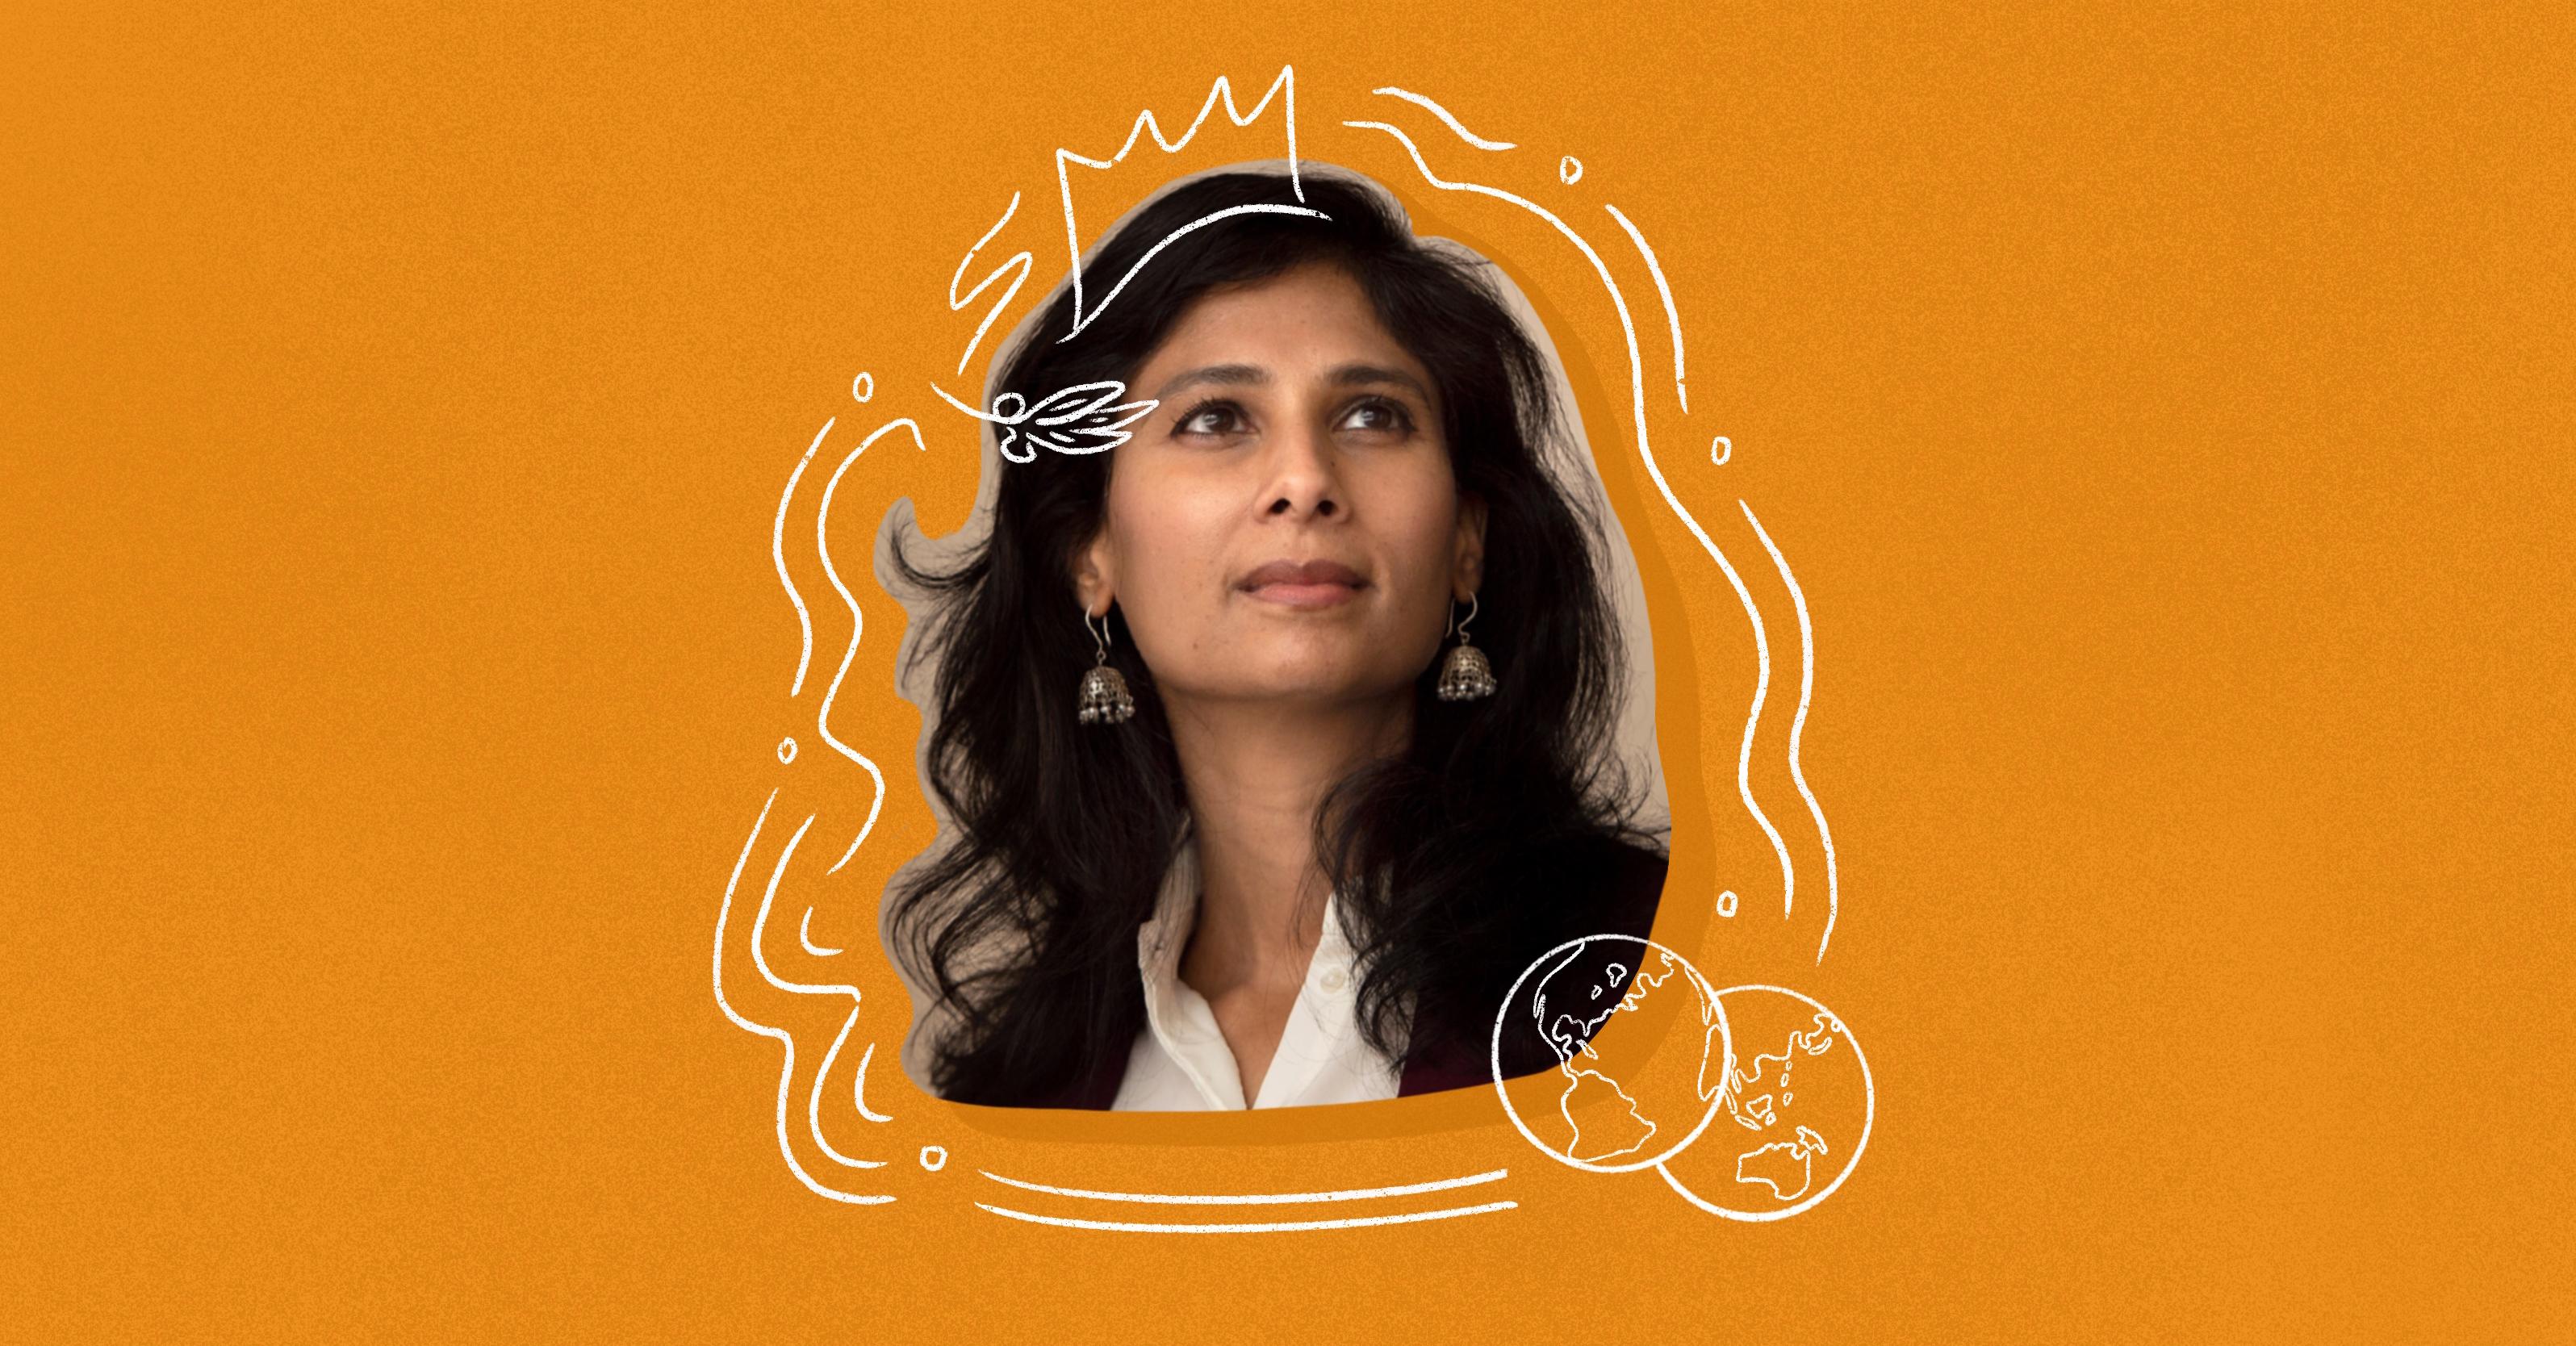 Photo illustration of Gita Gopinath on an orange background